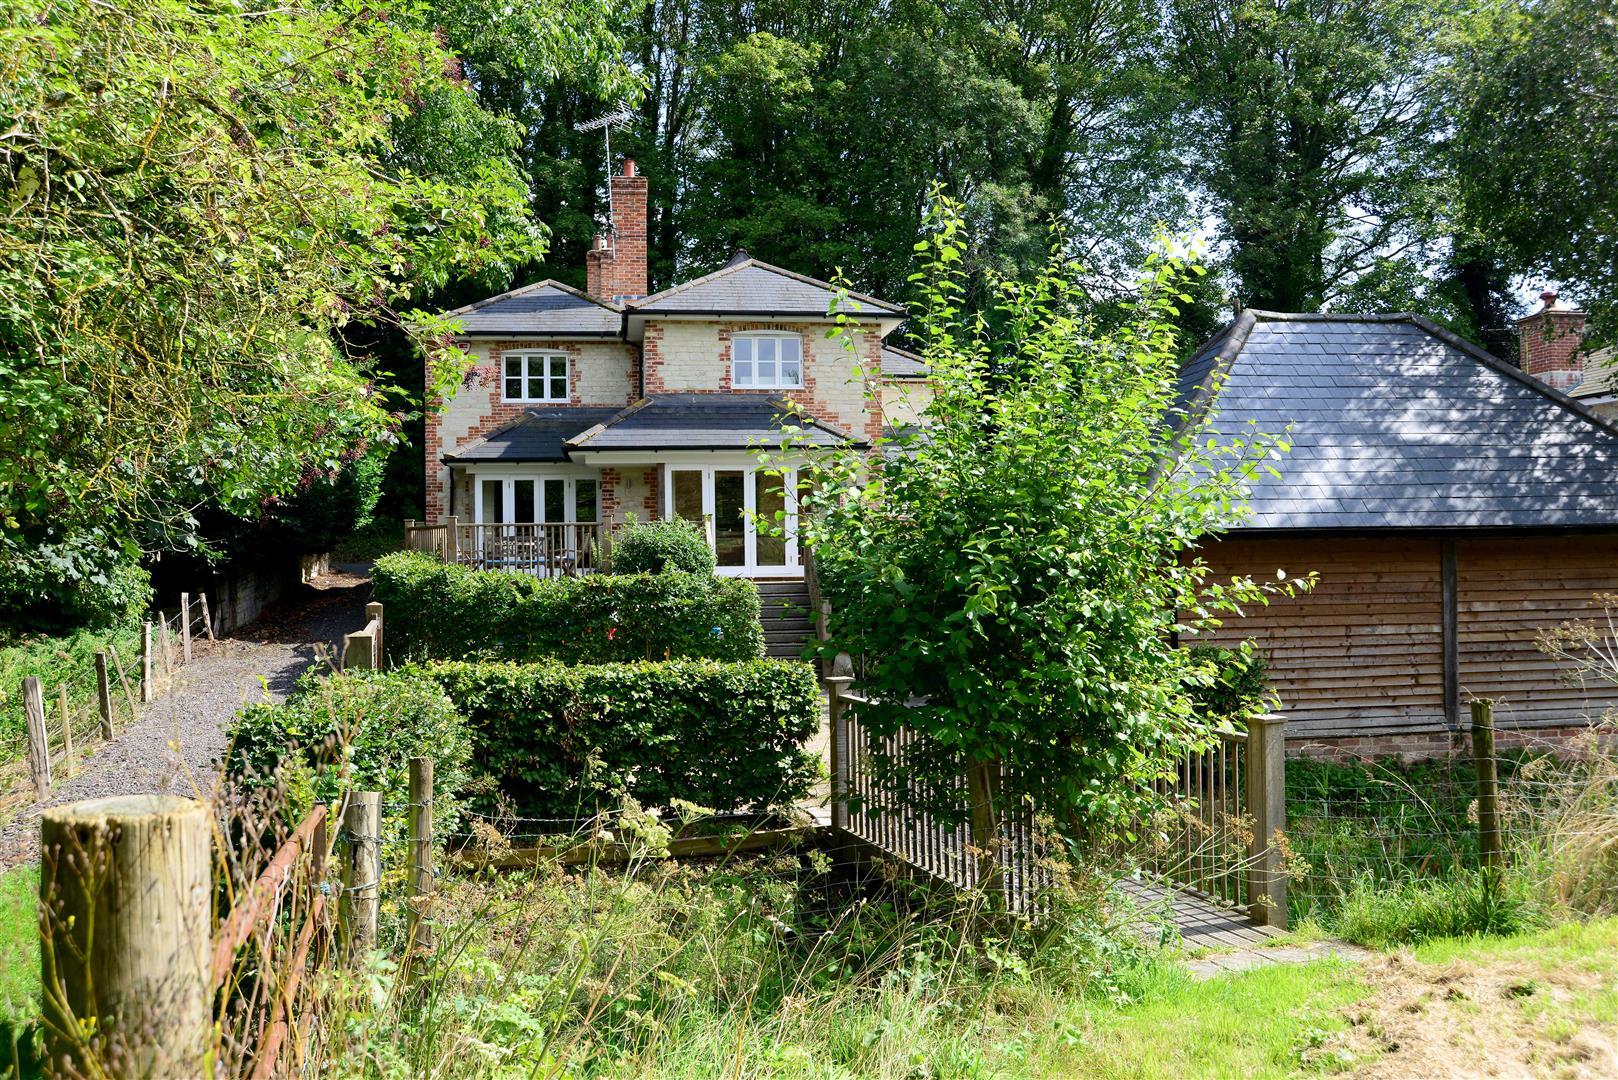 North Lane, Hampshire